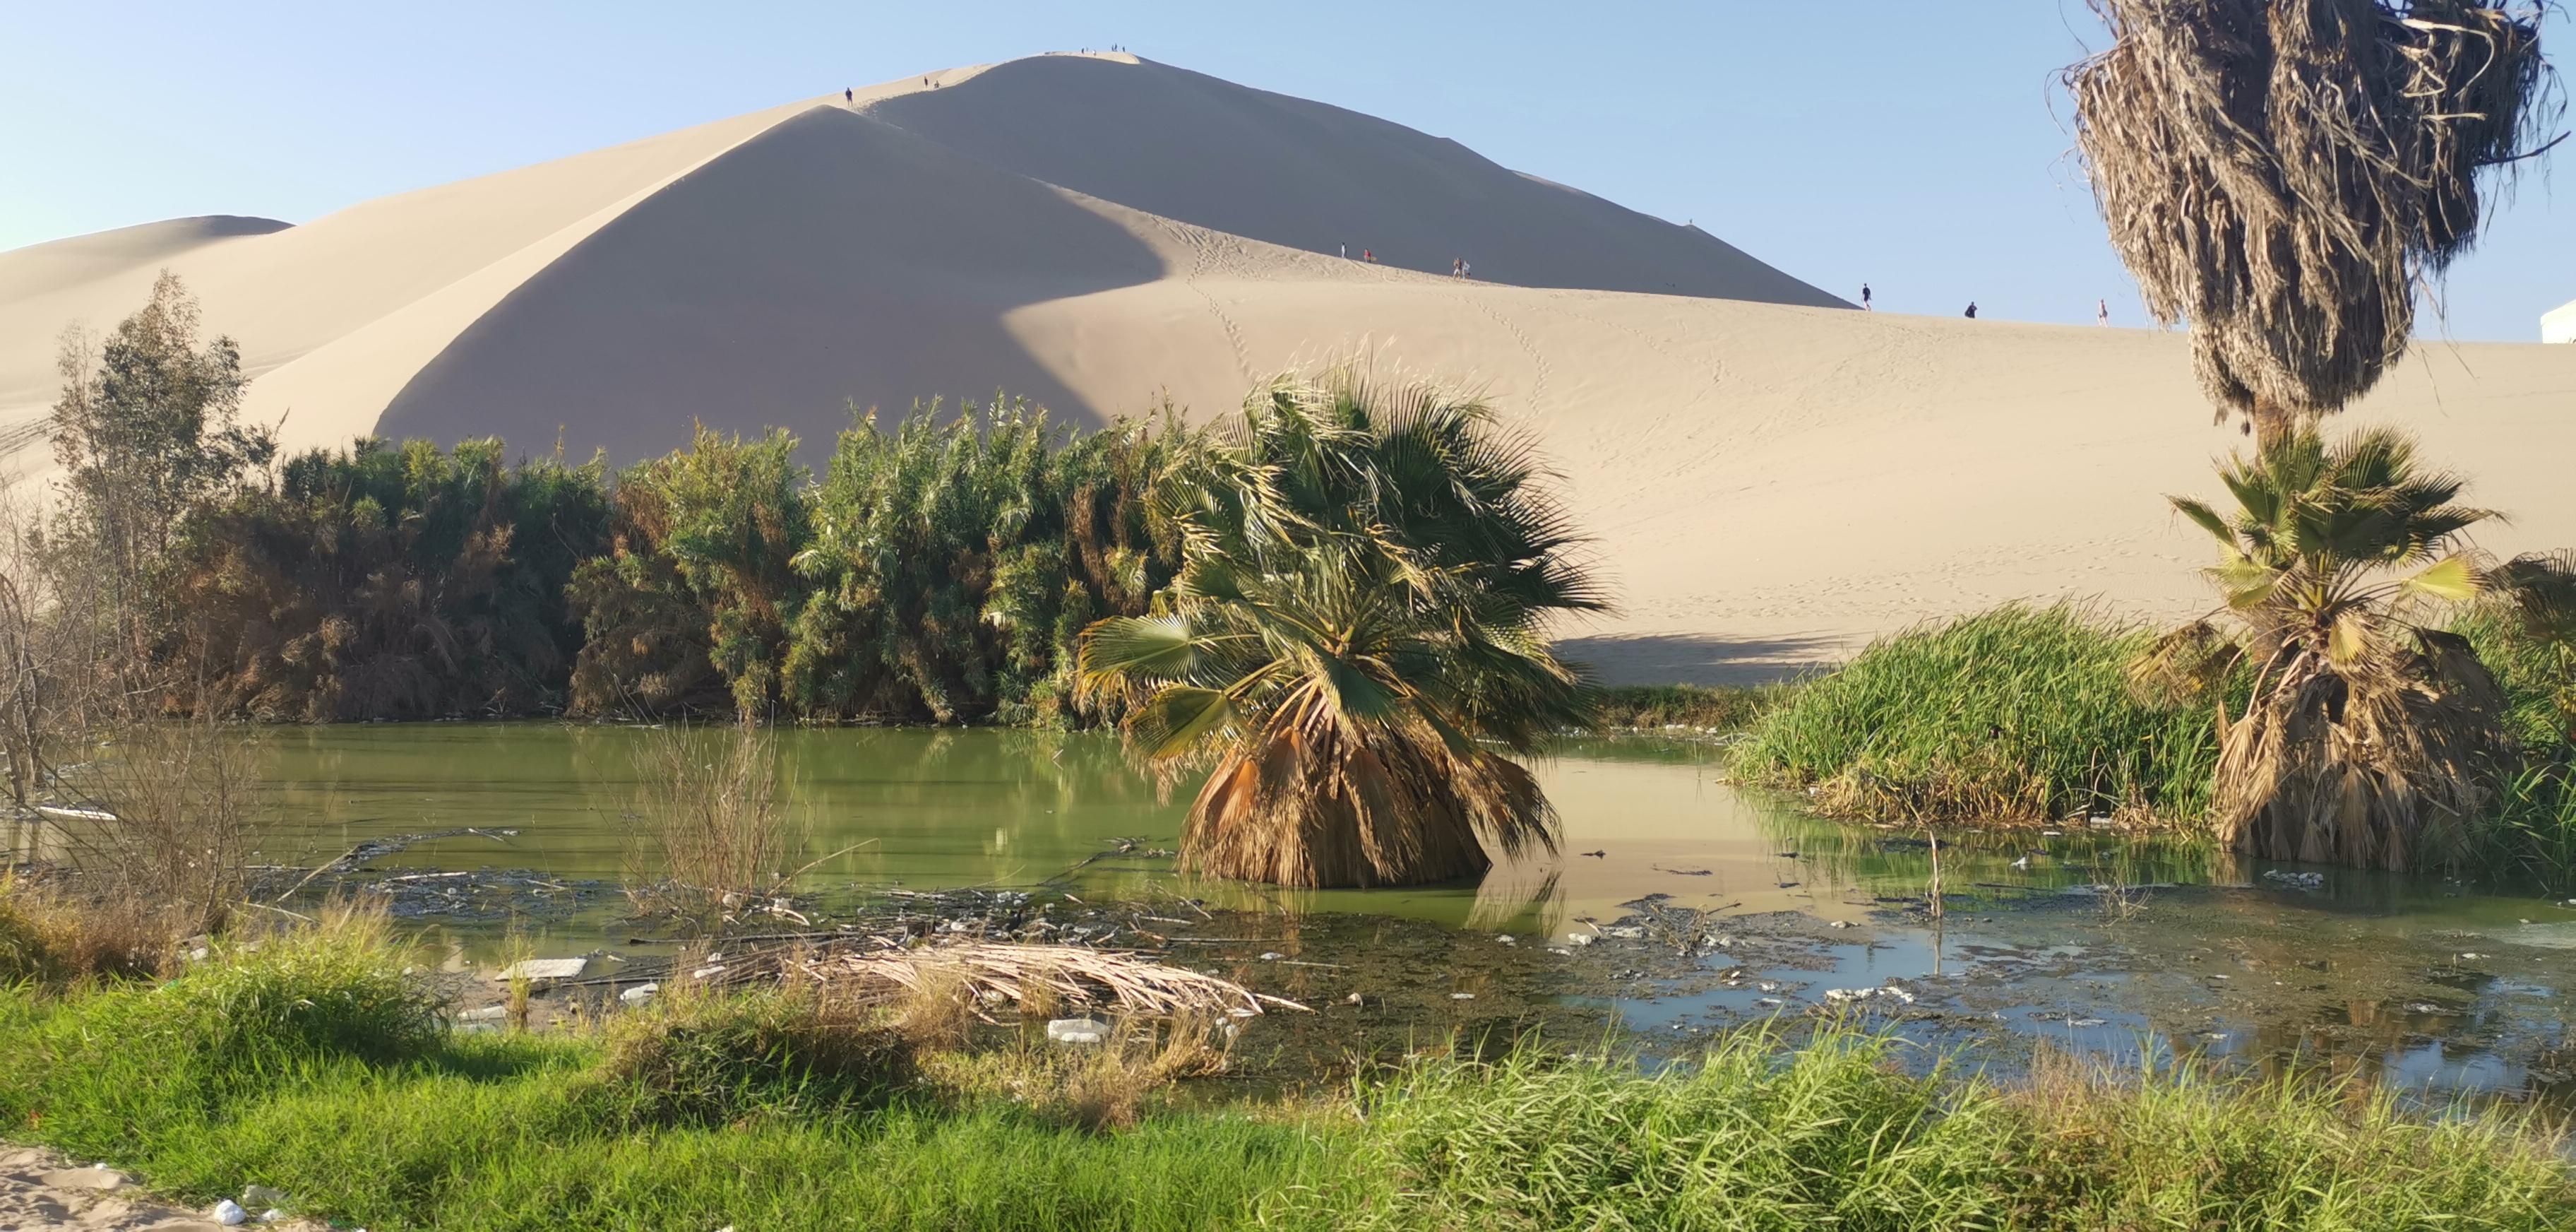 Peru déli síksága